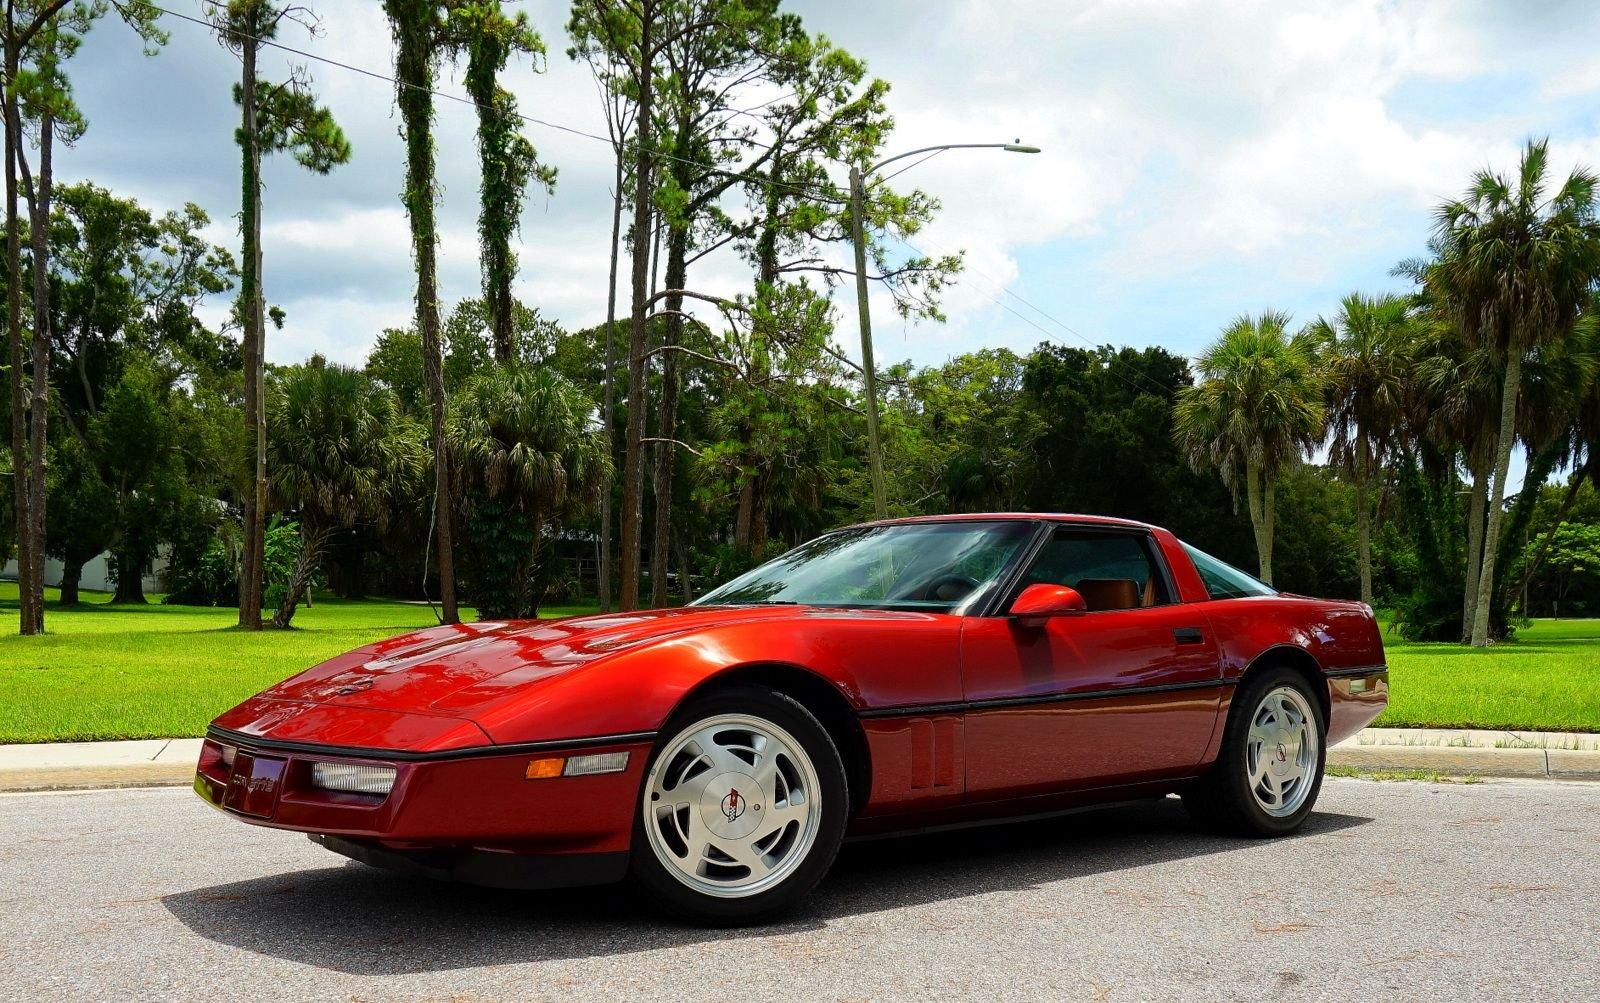 1988 chevrolet corvette 2dr hatchback coupe